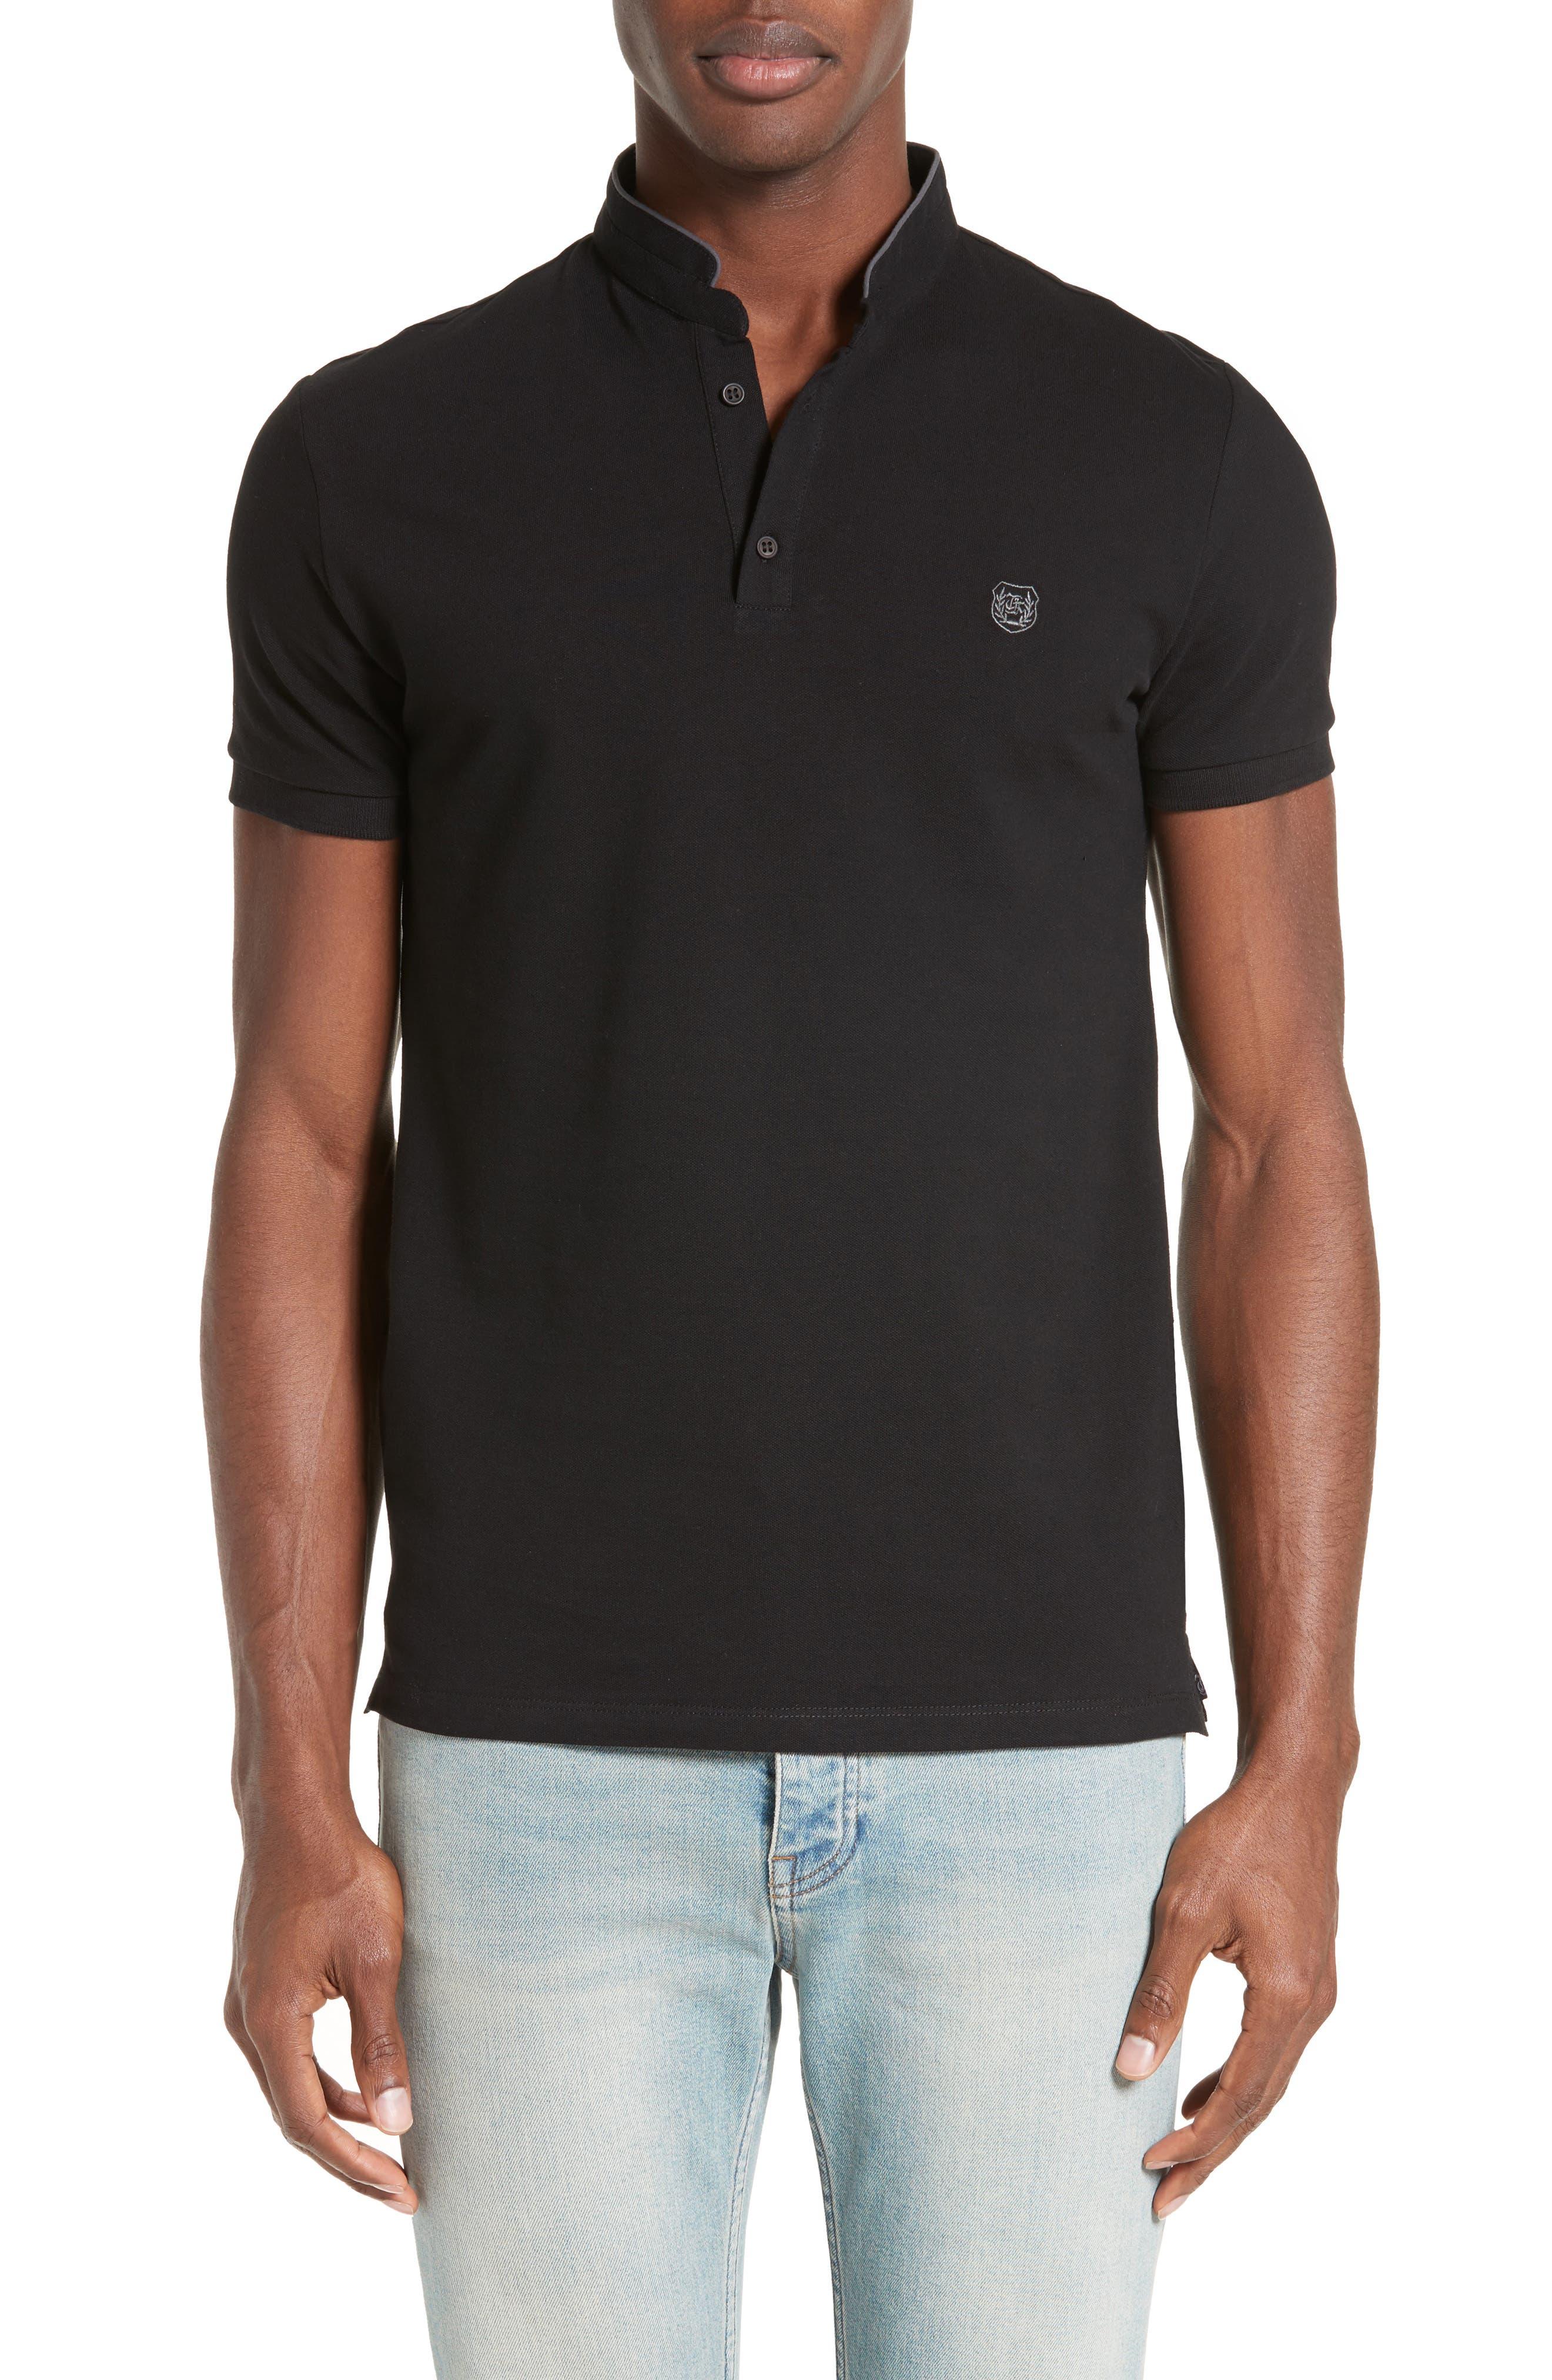 SPORT Pipe Trim Band Collar Piqué Polo,                         Main,                         color, Black/ Grey